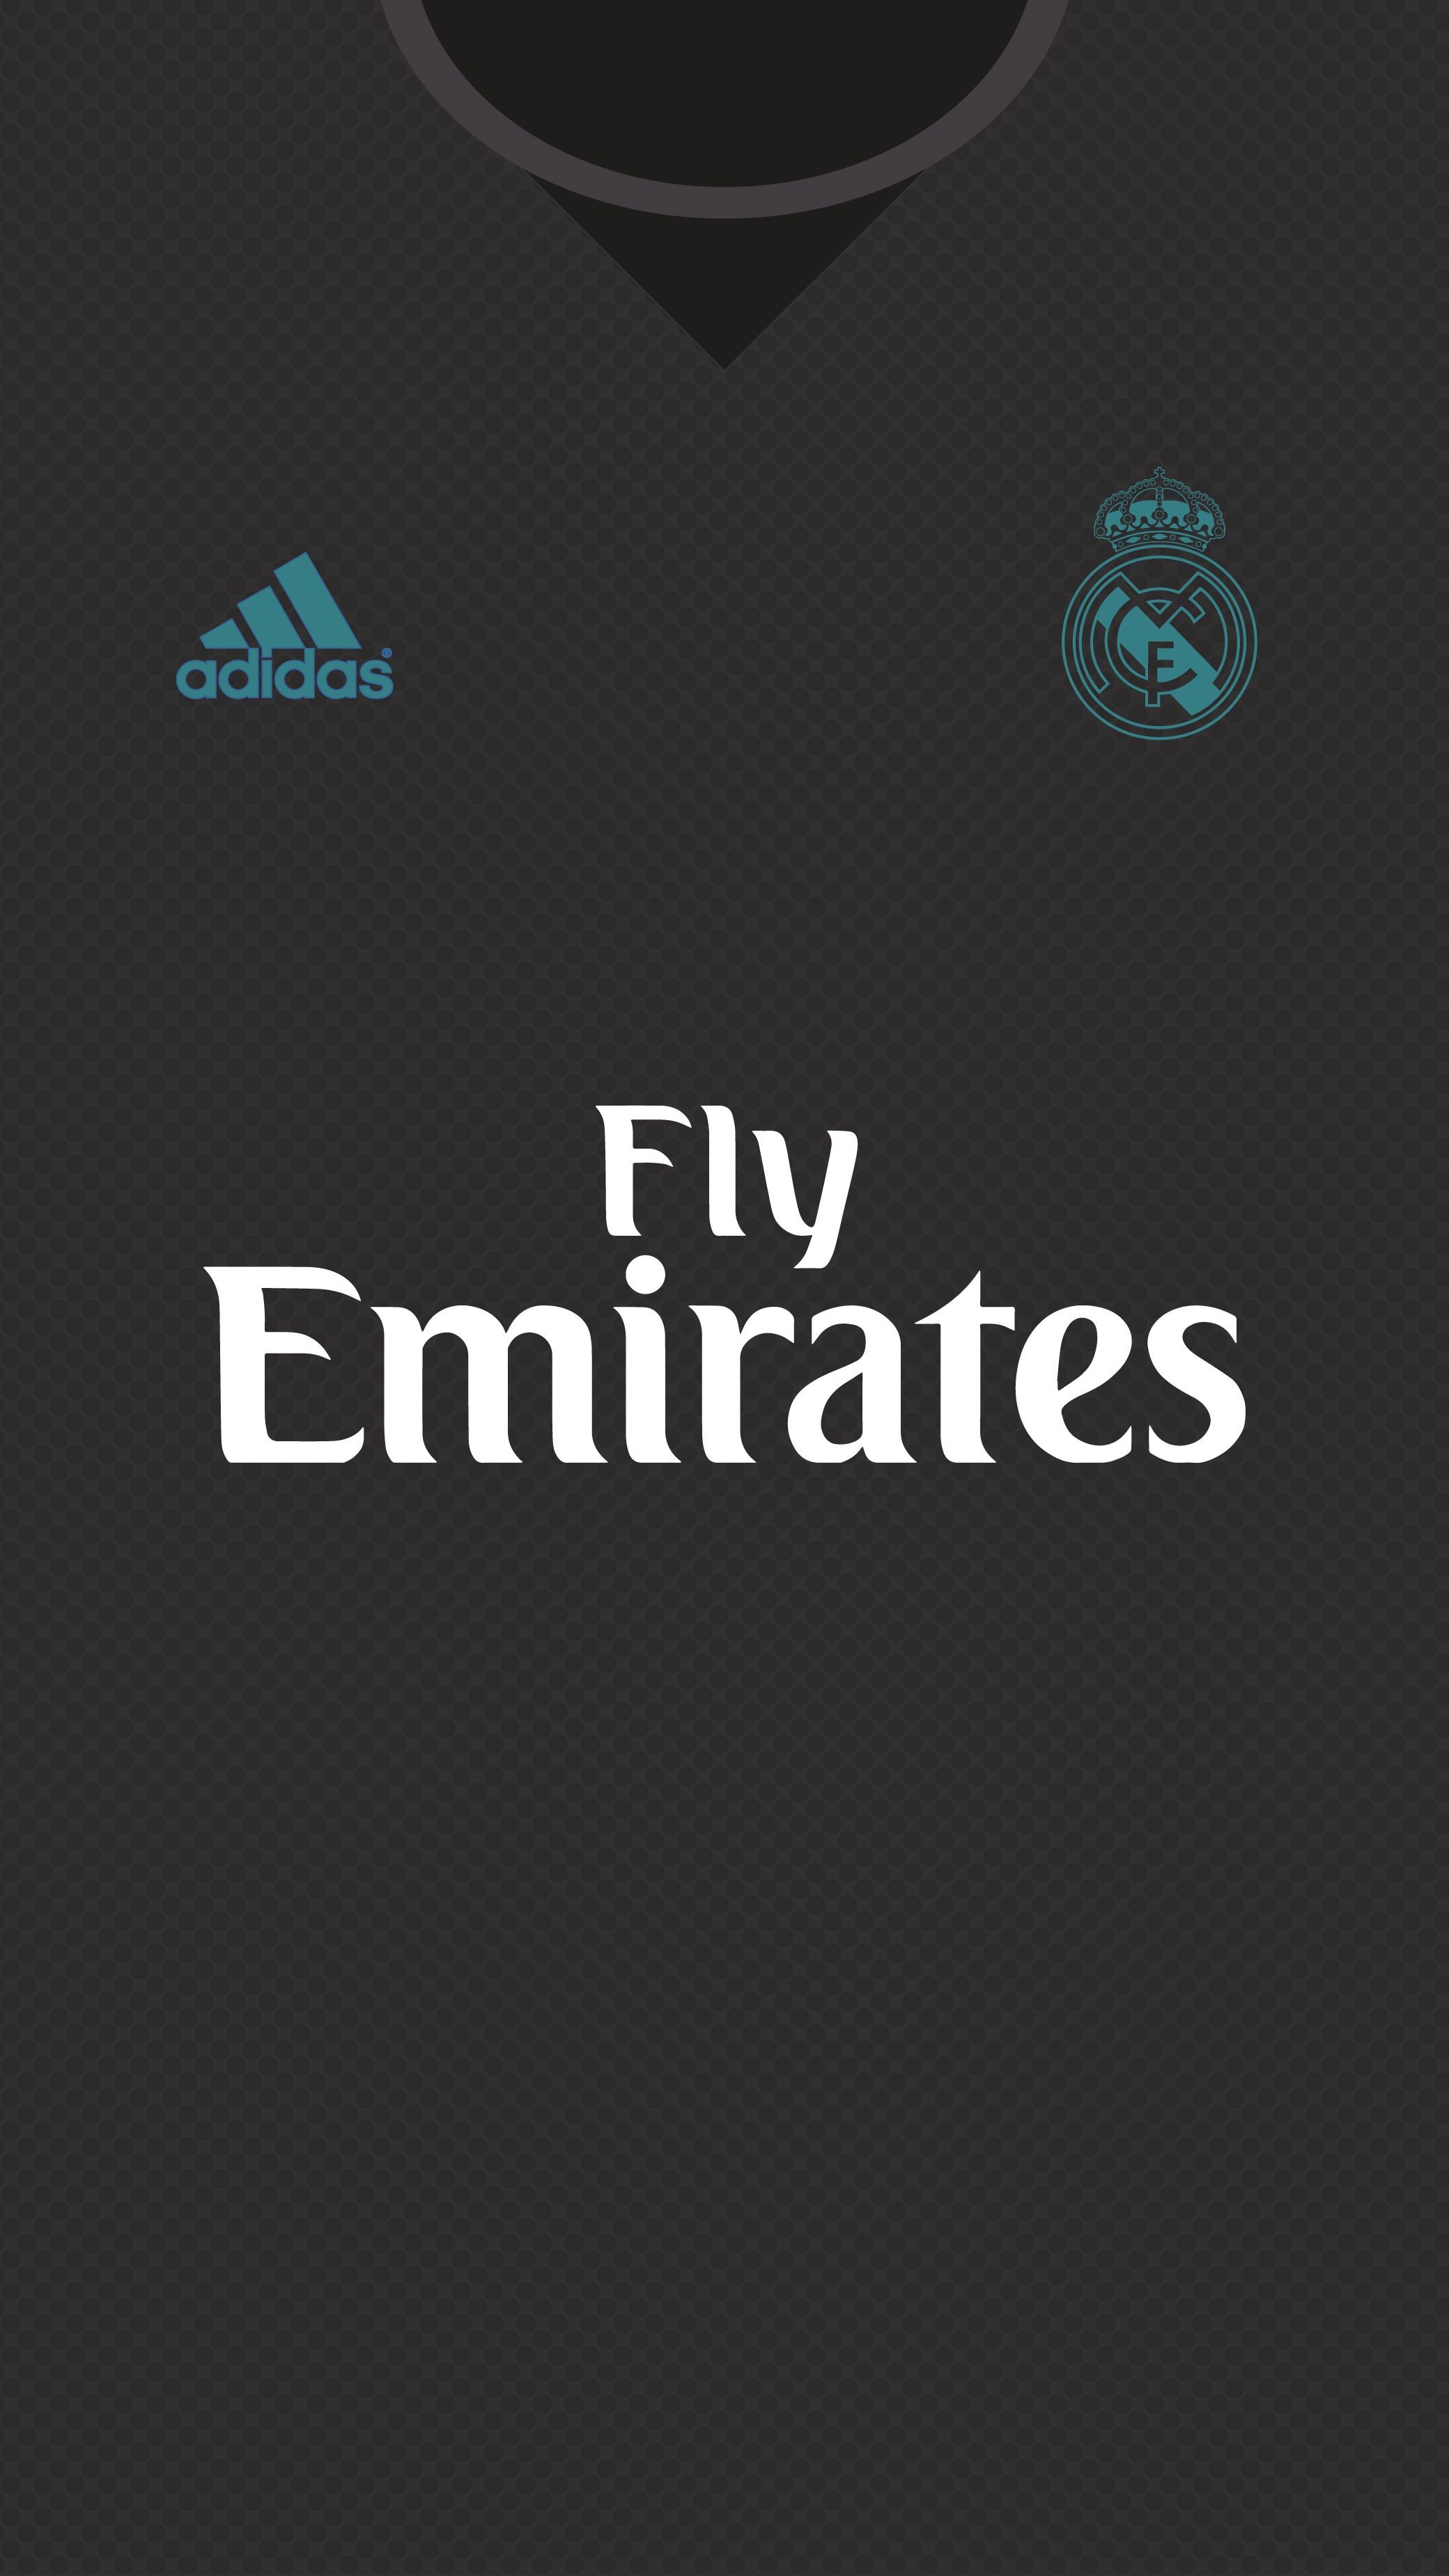 Res: 2080x3698, Real Madrid Kit 2017/18 | Wallpaper for mobile on Behance